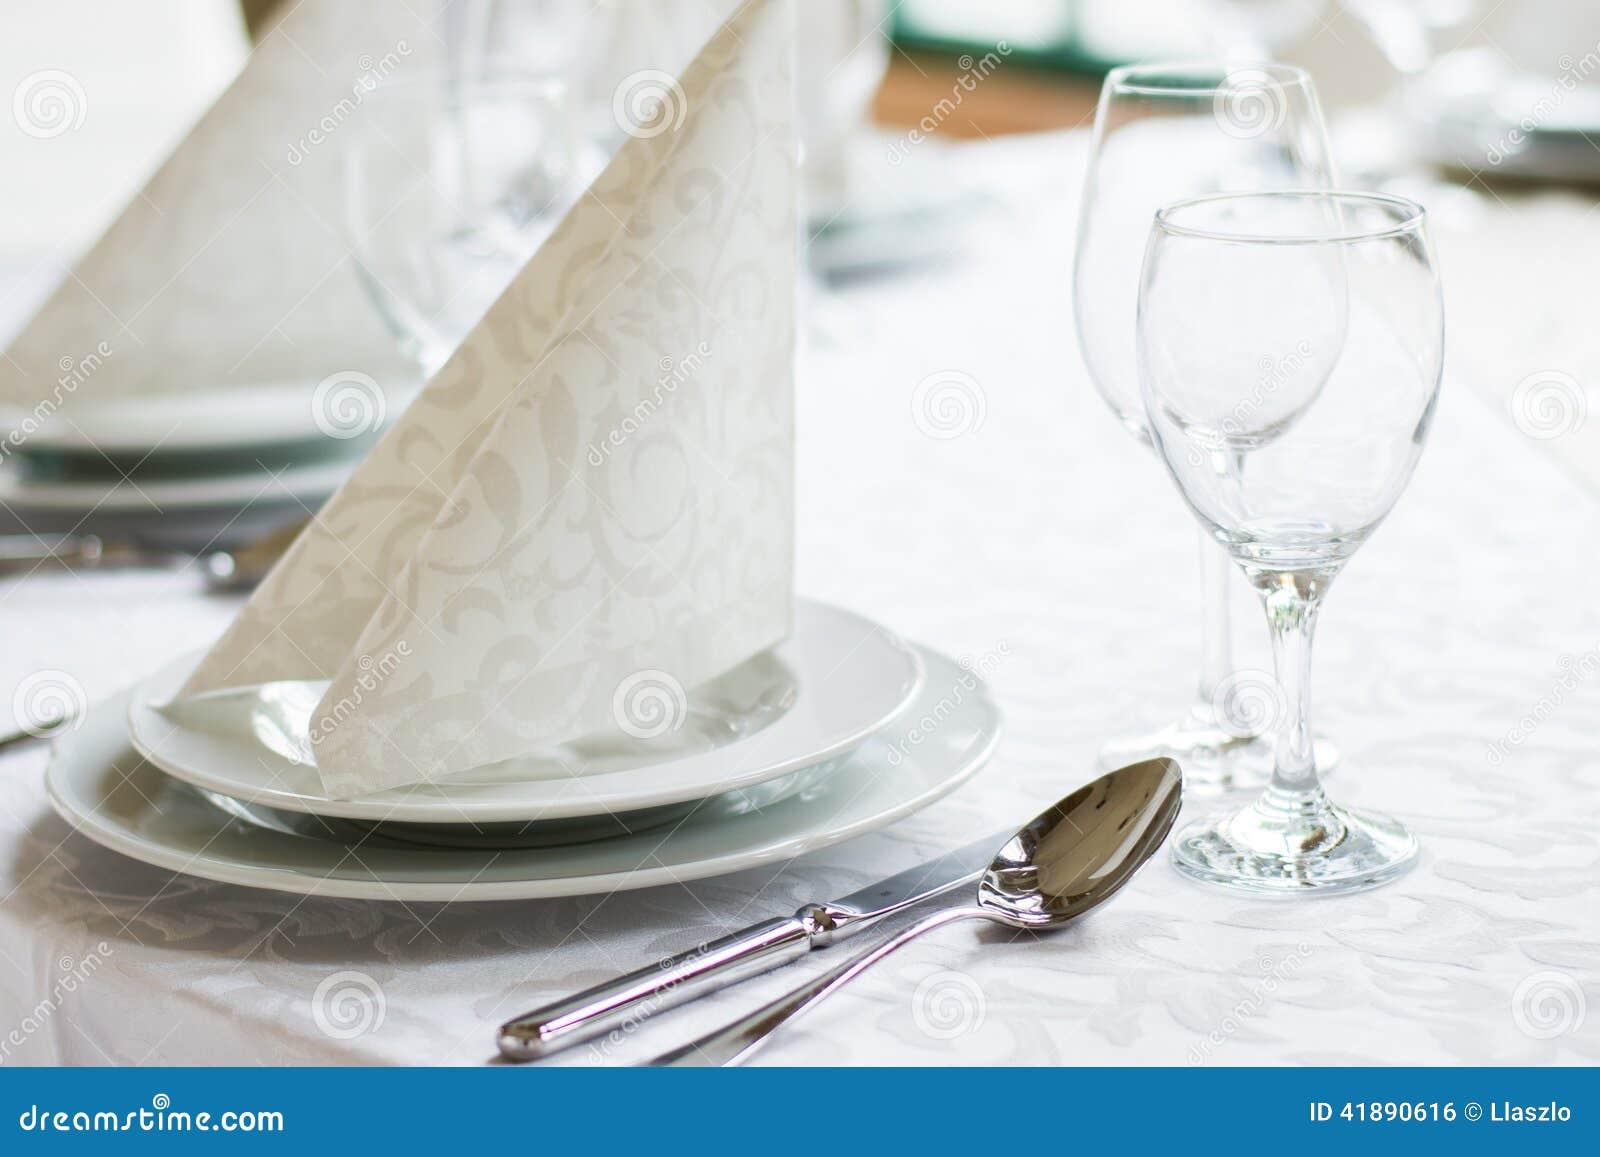 White Wedding Reception Place Setting Stock Photo Image Of Party White 41890616